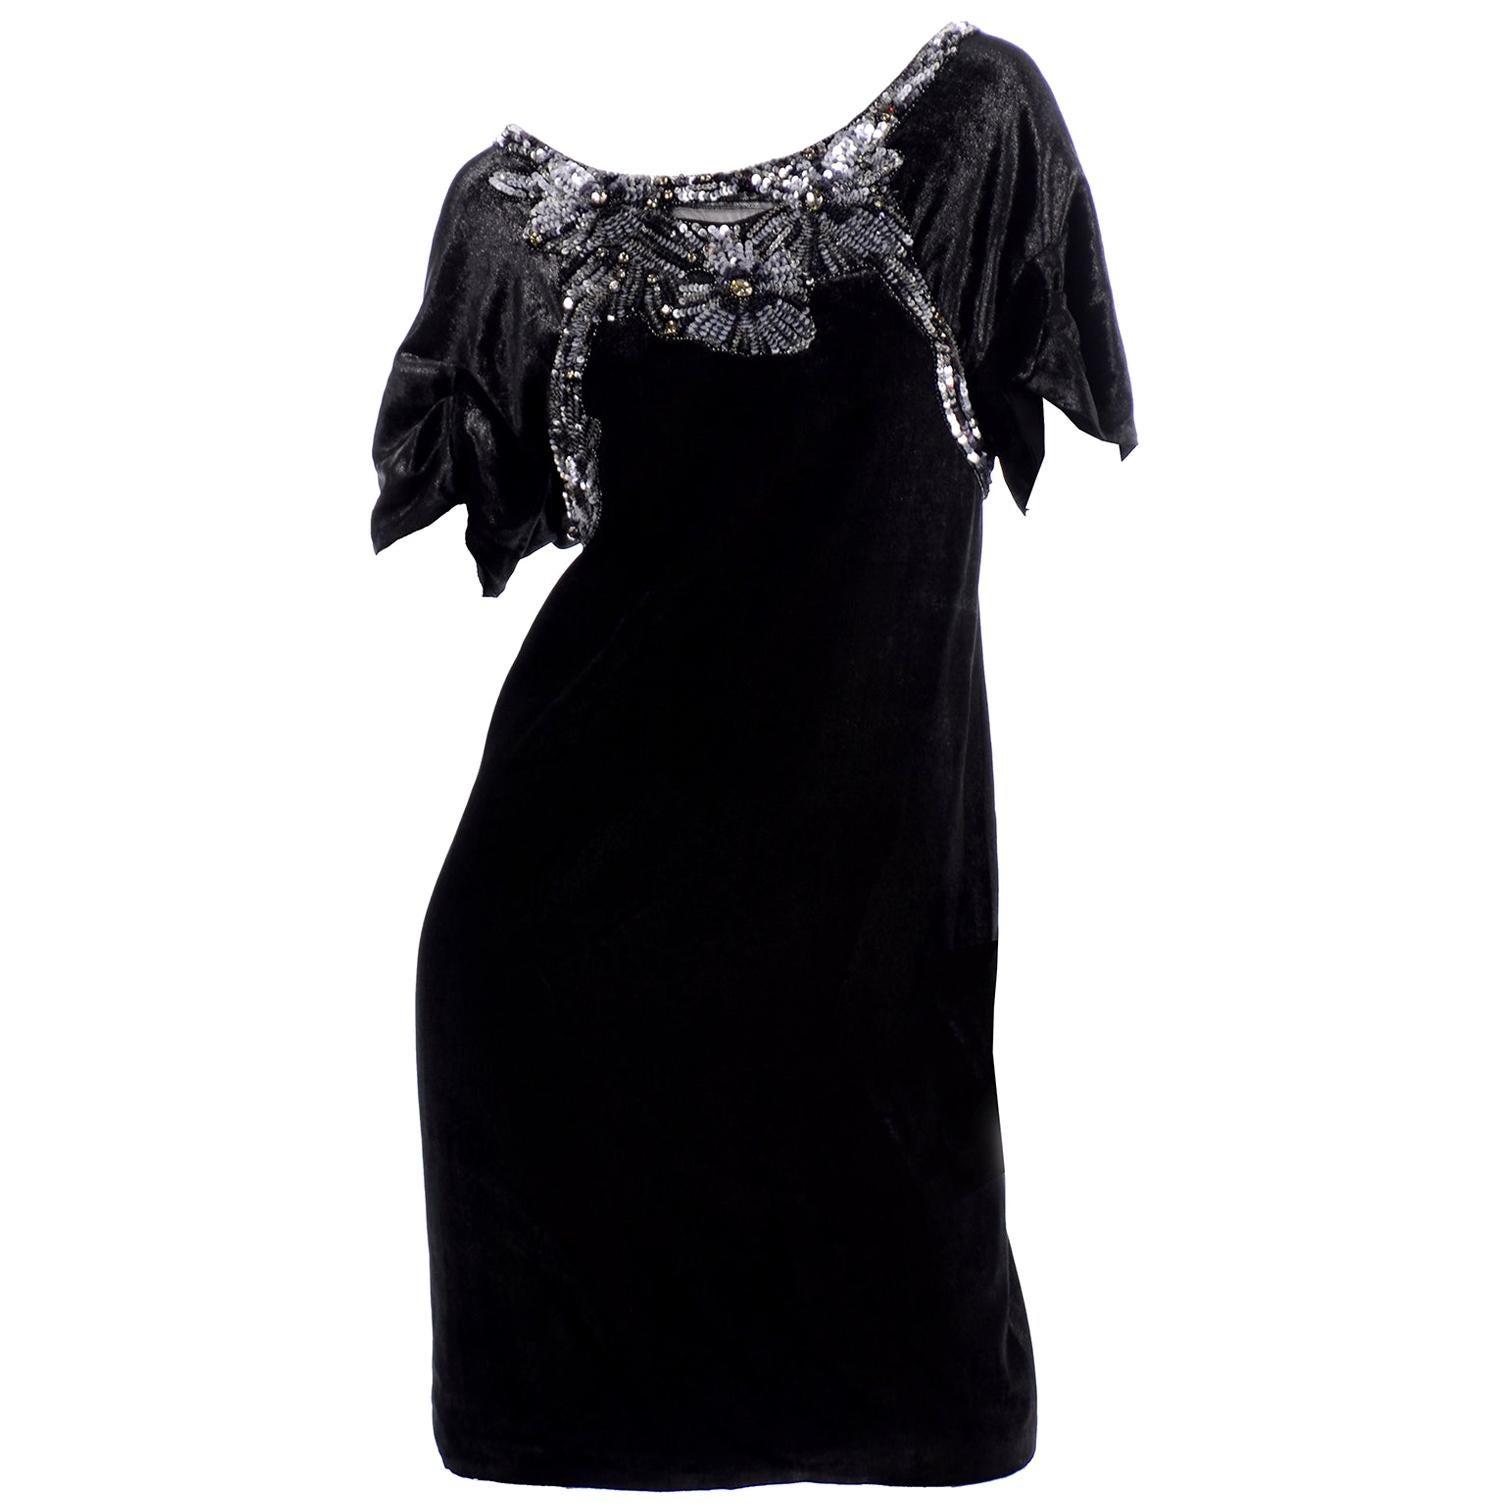 Alberta Ferretti Black Velvet Evening Dress With Sequins and Beads